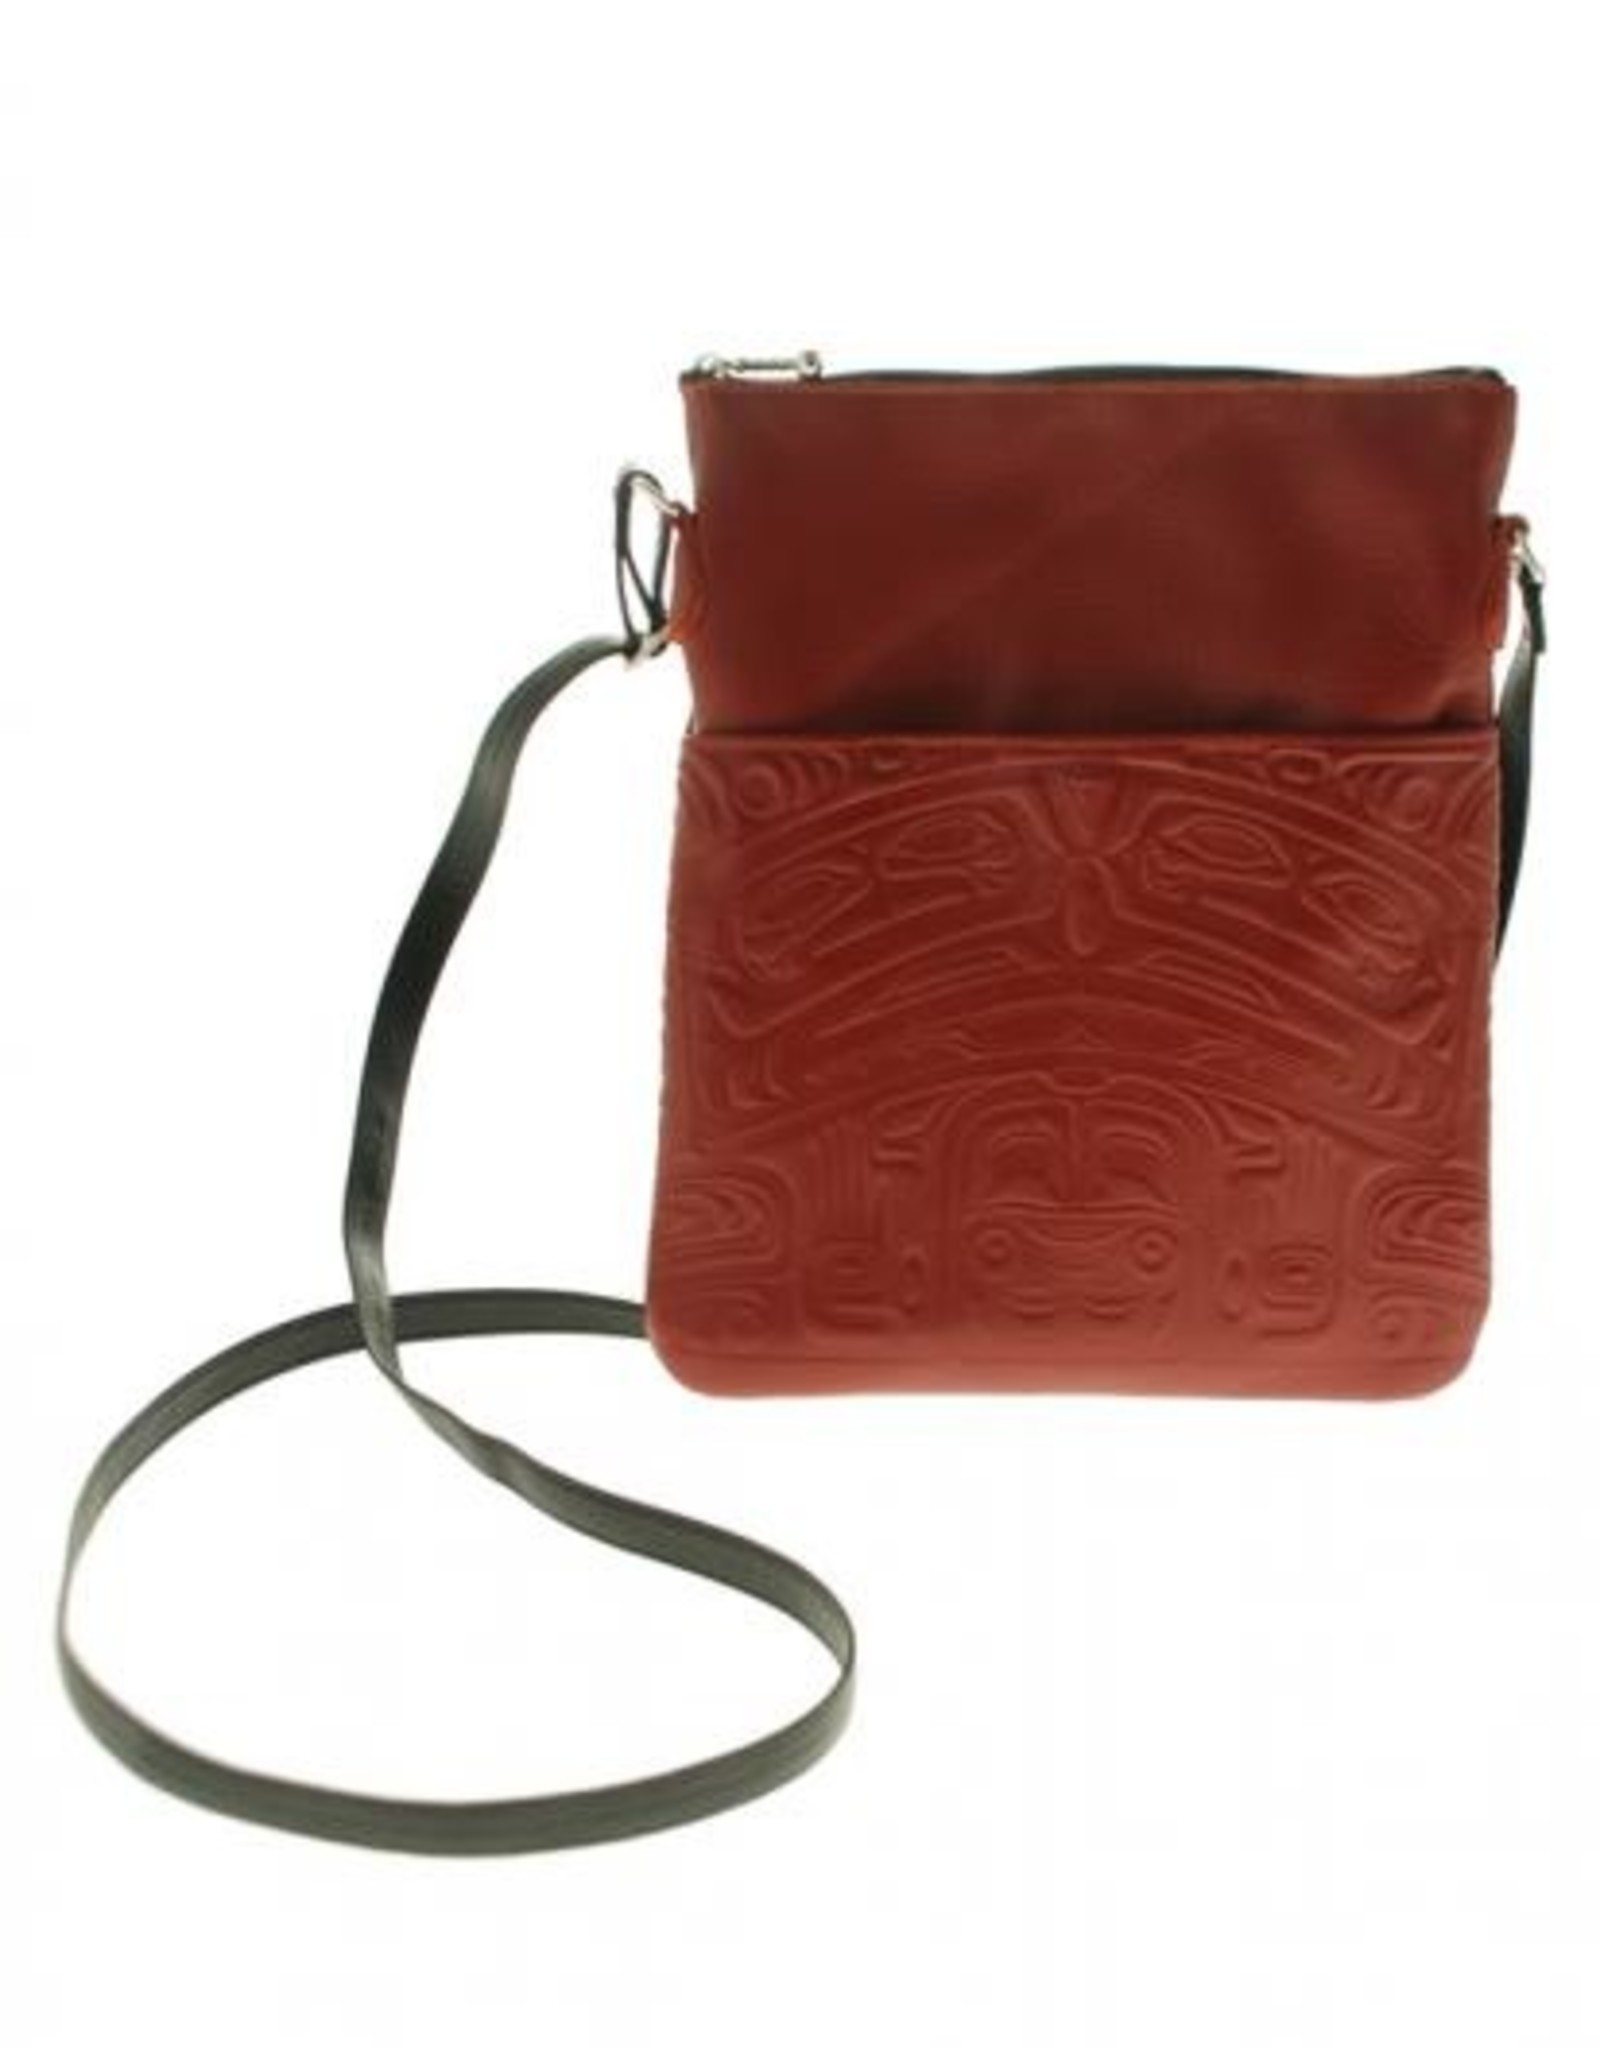 Solo Bag Bear Box Design - Leather